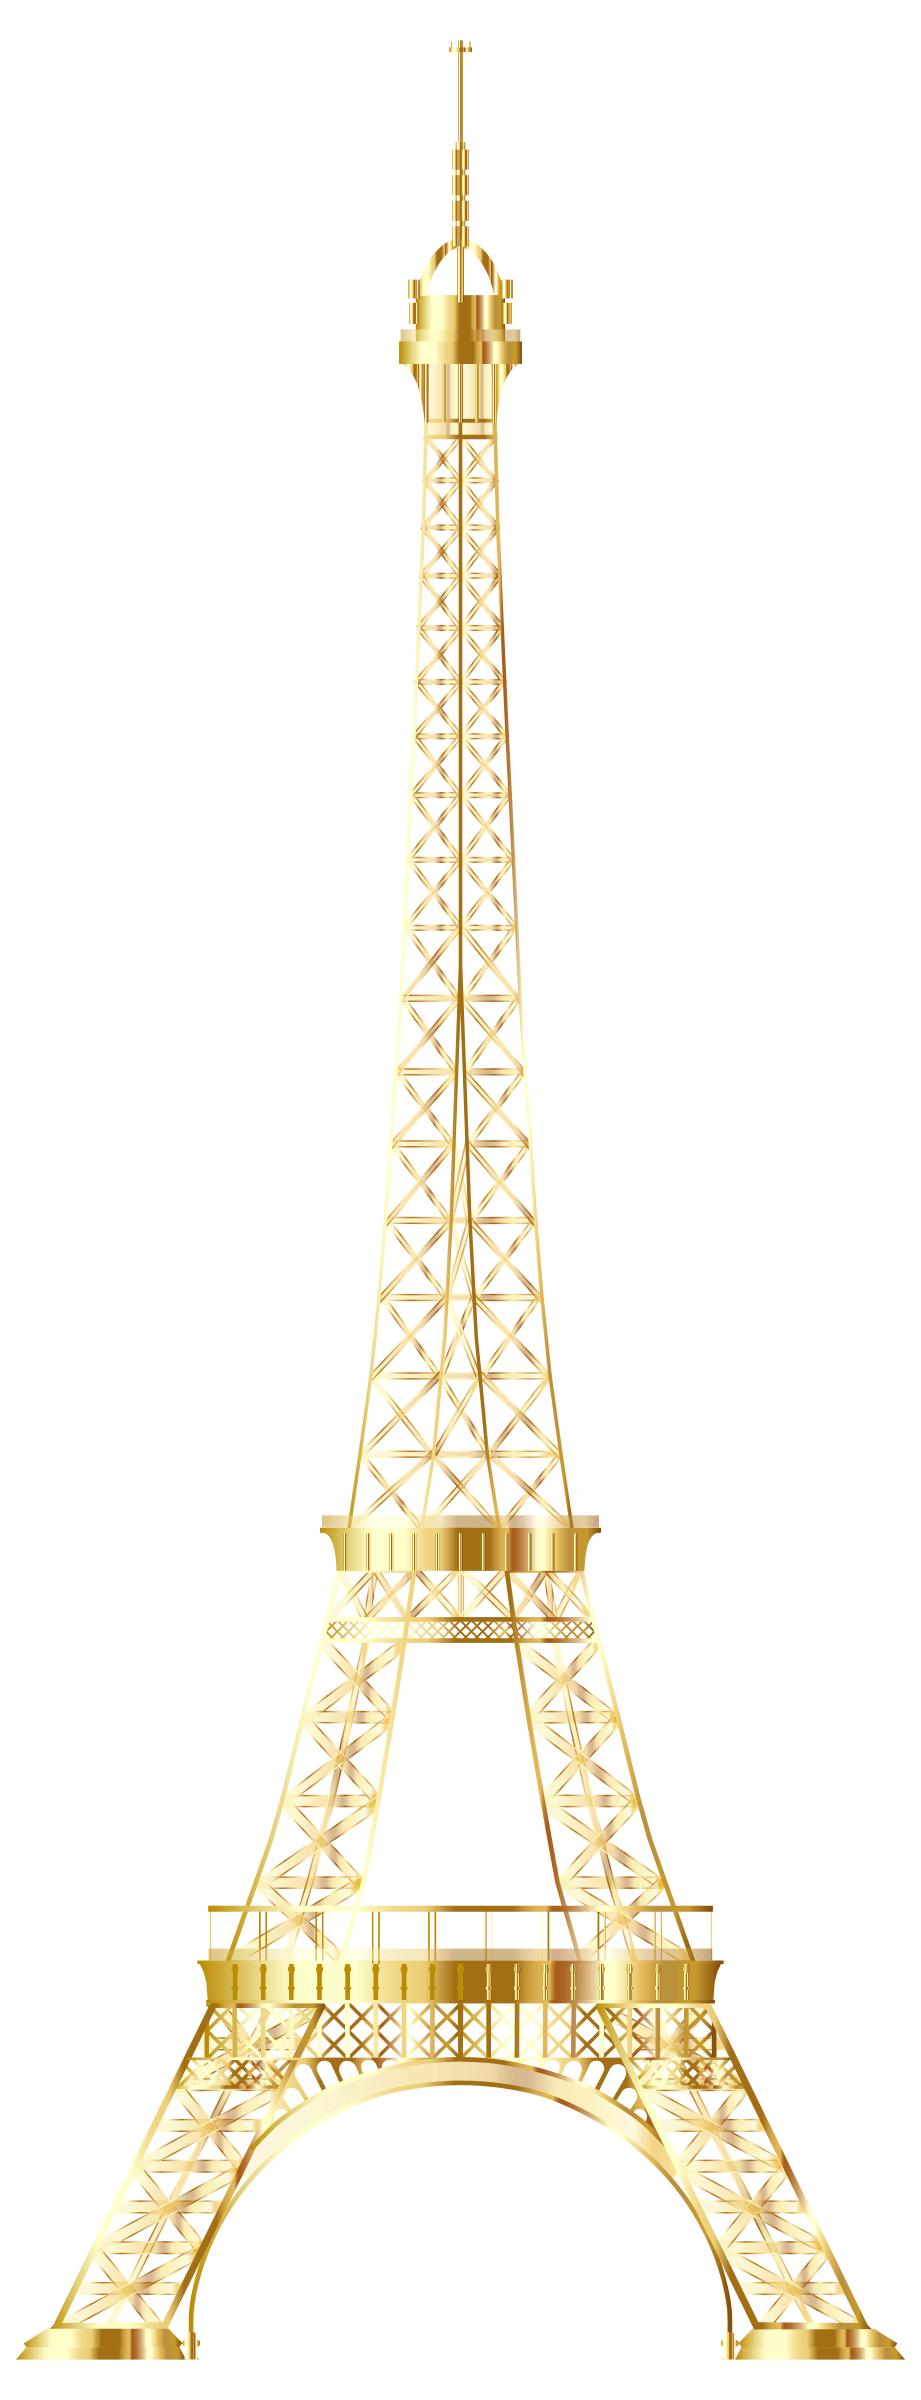 Black Silver Glitter Wallpaper Clipart Eiffel Tower Gold No Background